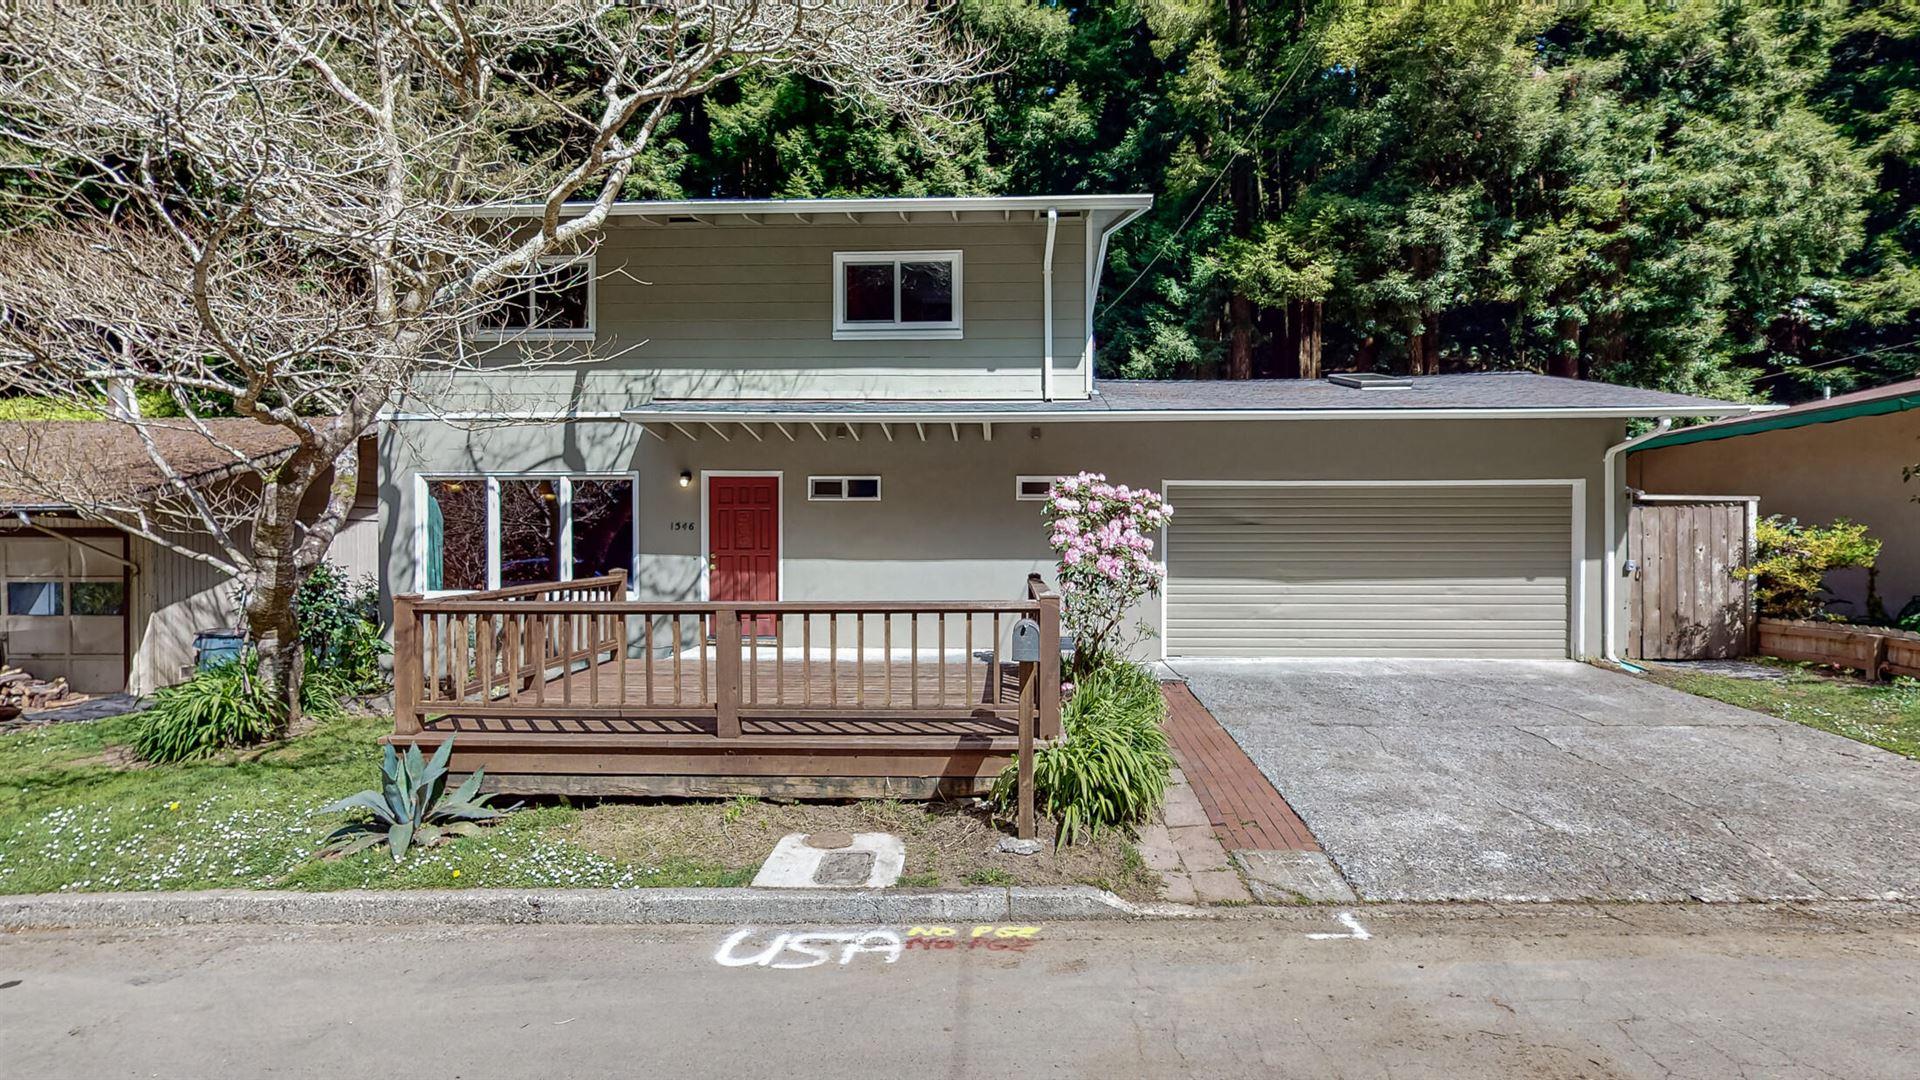 1546 Beverly Drive, Arcata, CA 95521 - MLS#: 258790